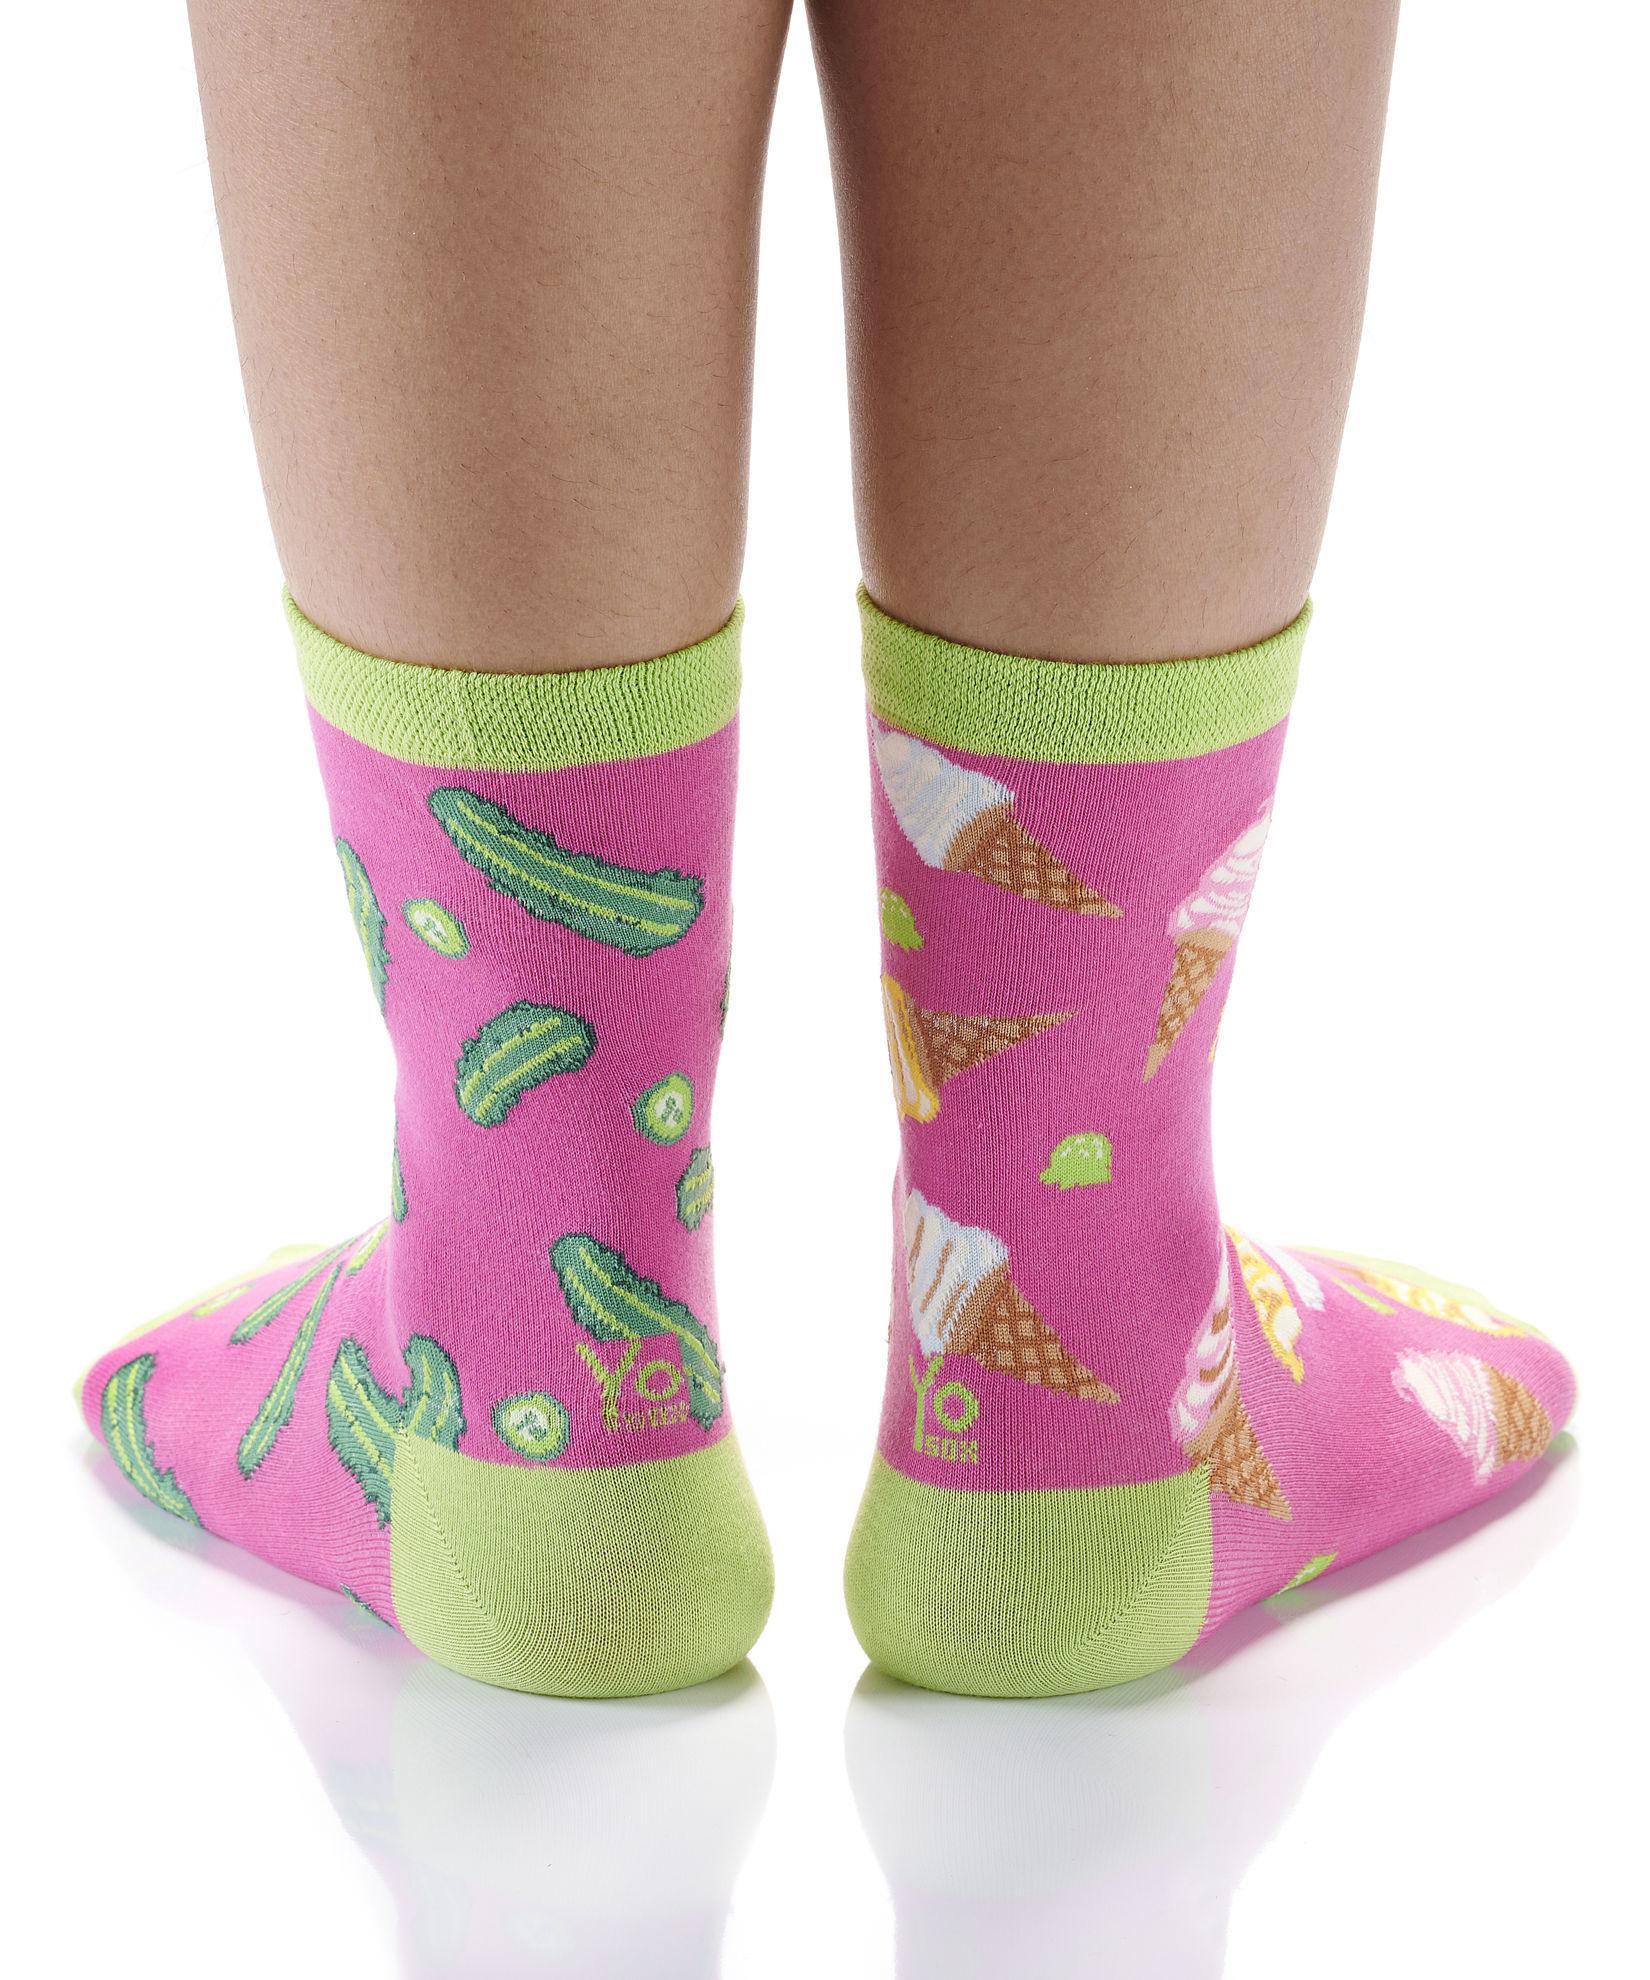 Pickle & Ice Cream Women's Crew Socks by Yo Sox